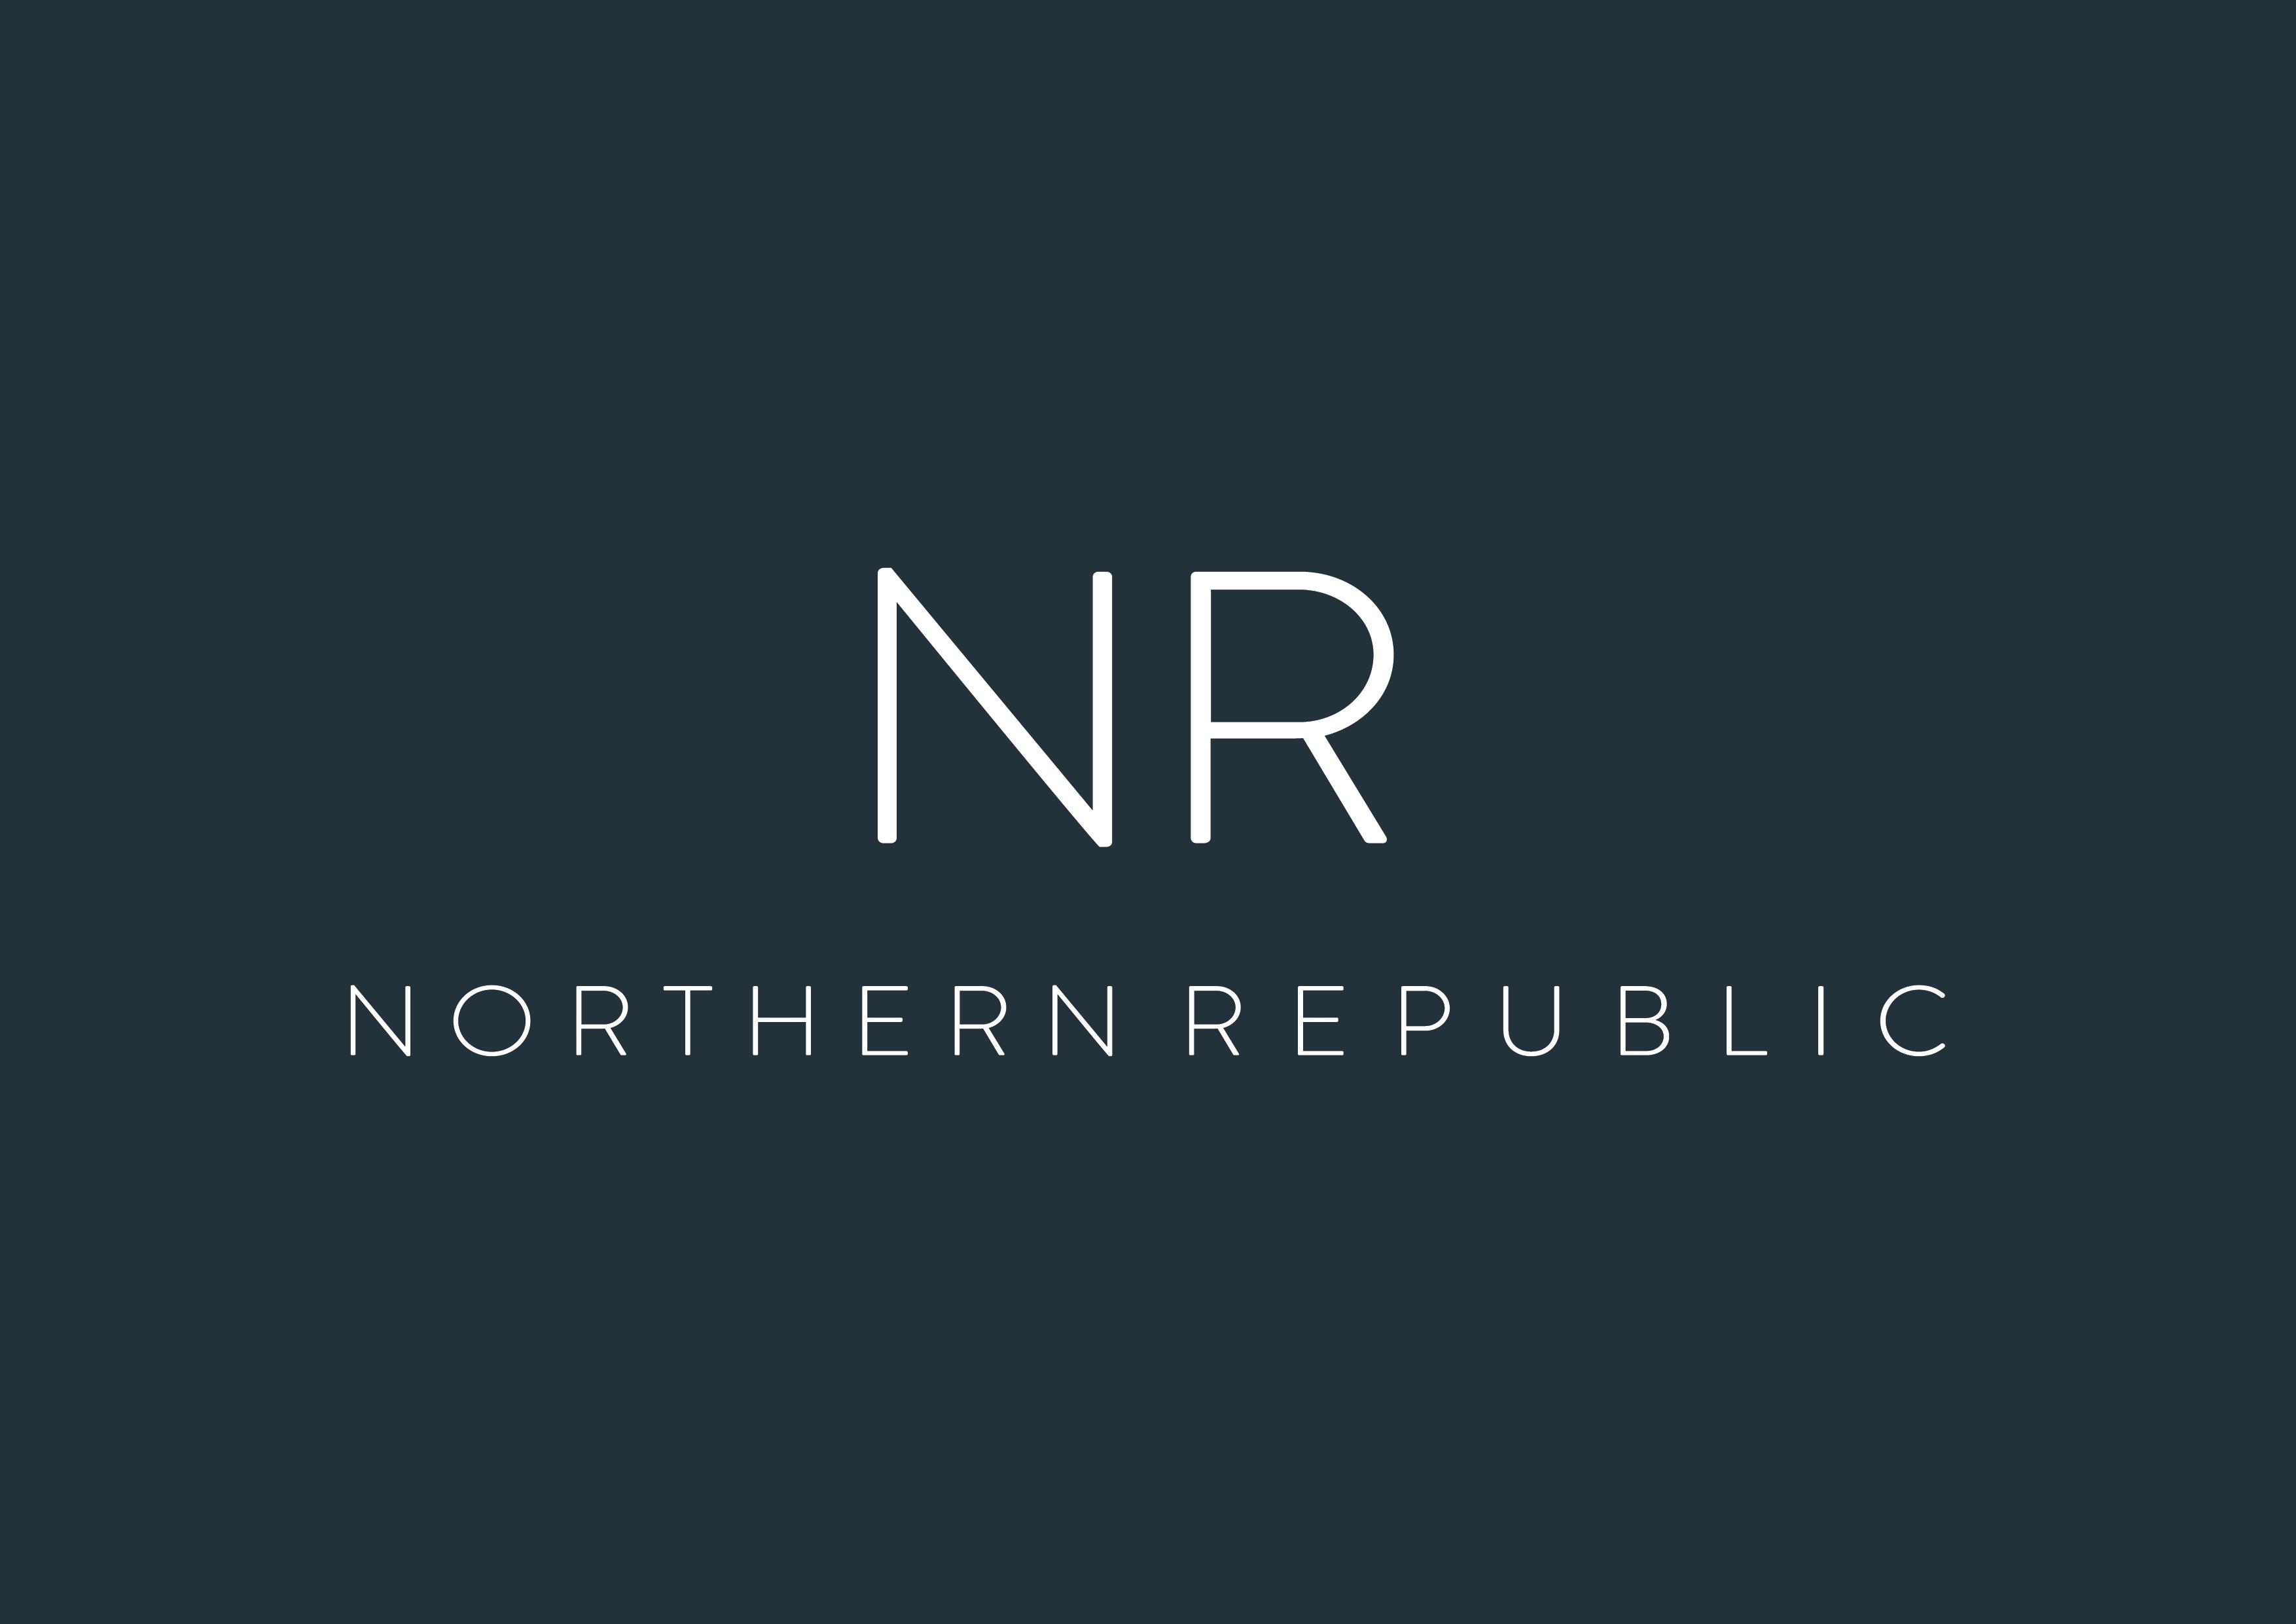 Northern Republic